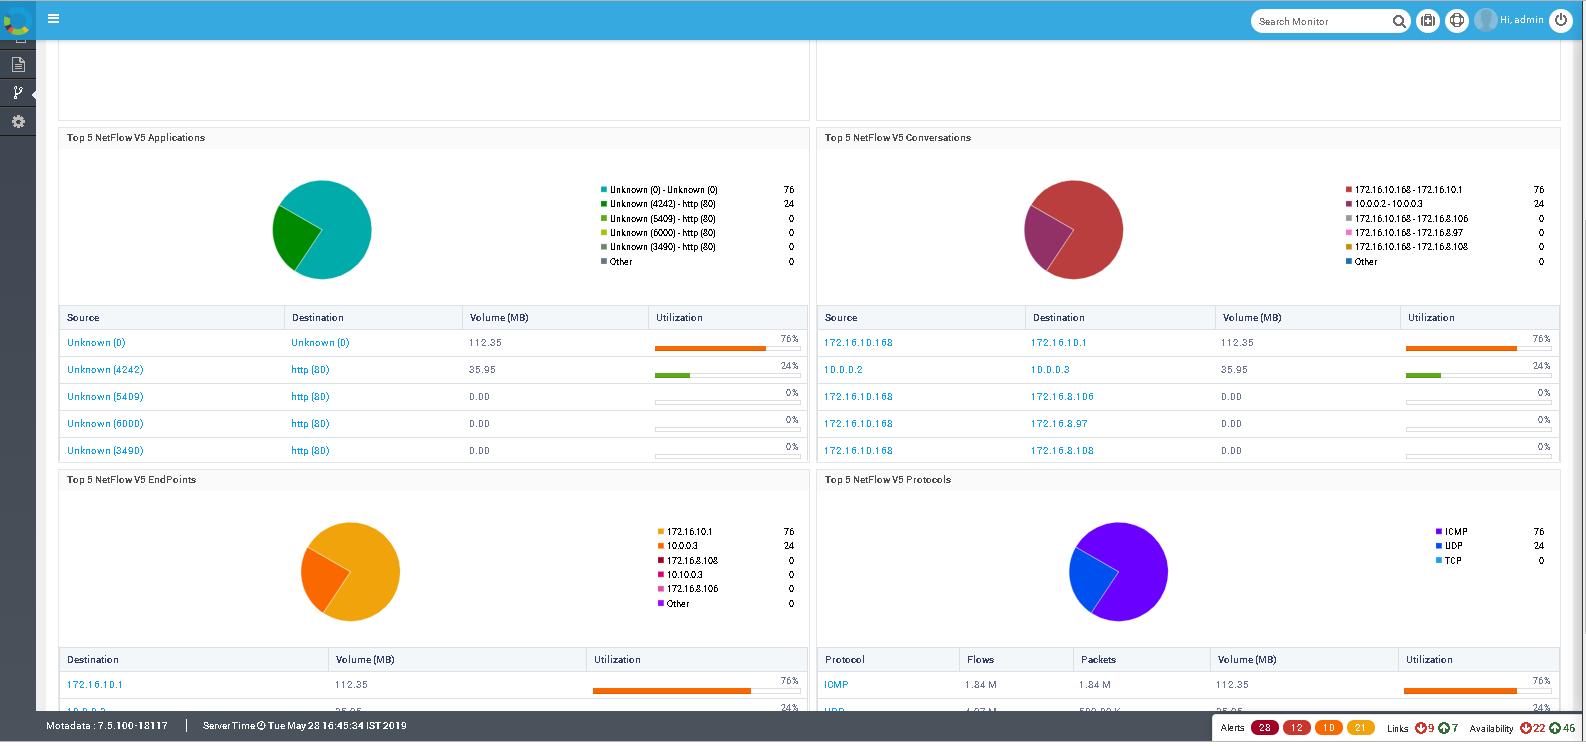 Official Motadata Blog | NMS, Log & Flow Analytics, ITSM